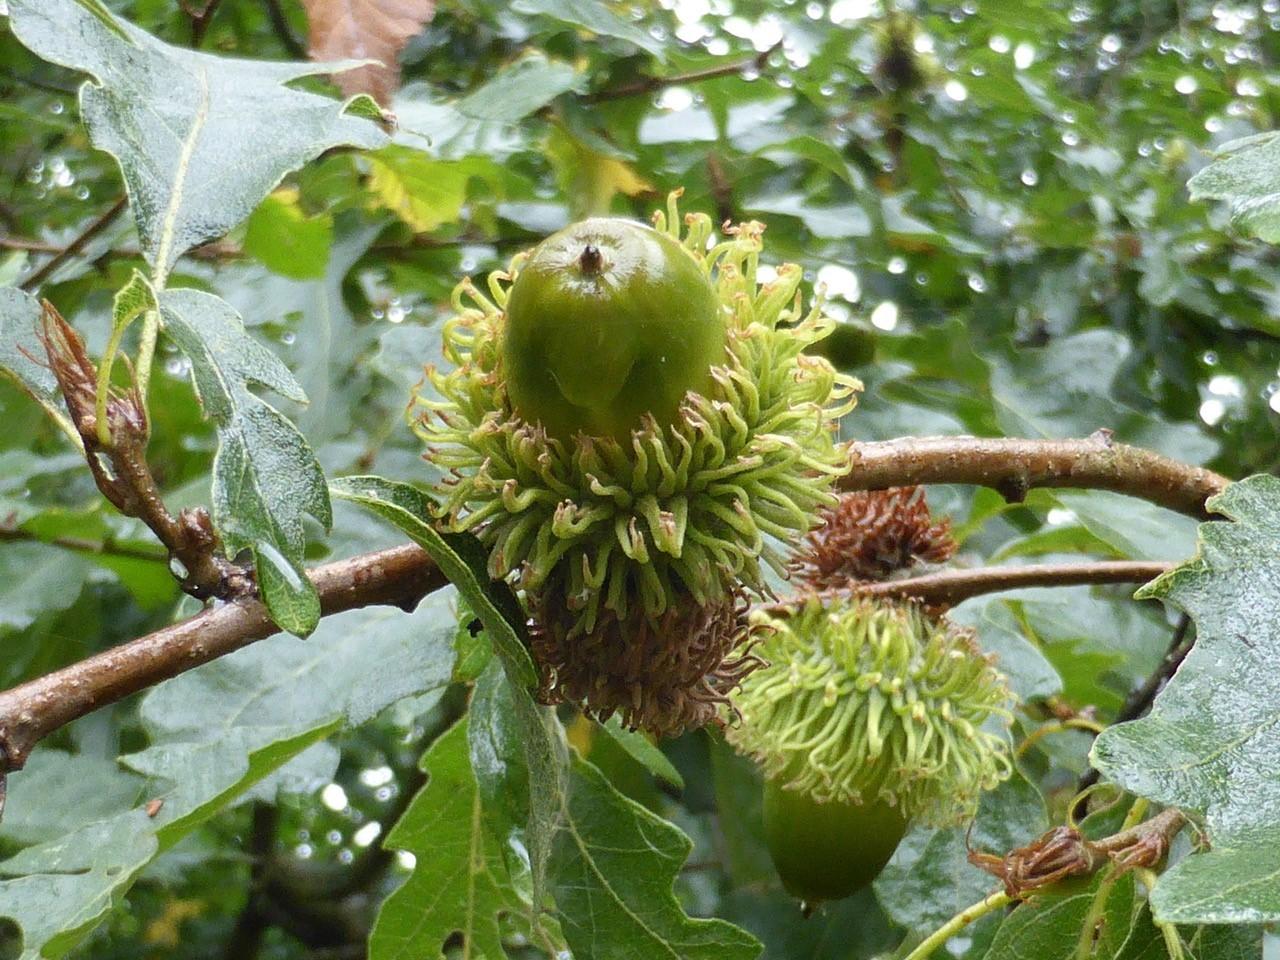 Turkey Oak (Quercus cerris), Blaxton, Doncaster.